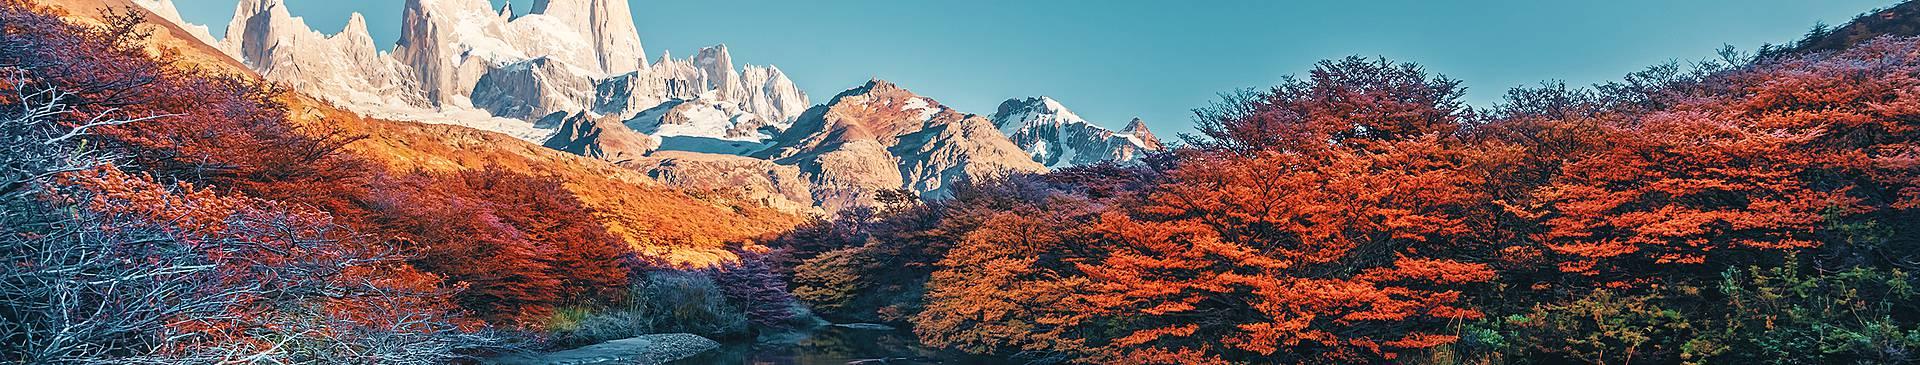 Viaggi in Patagonia in autunno